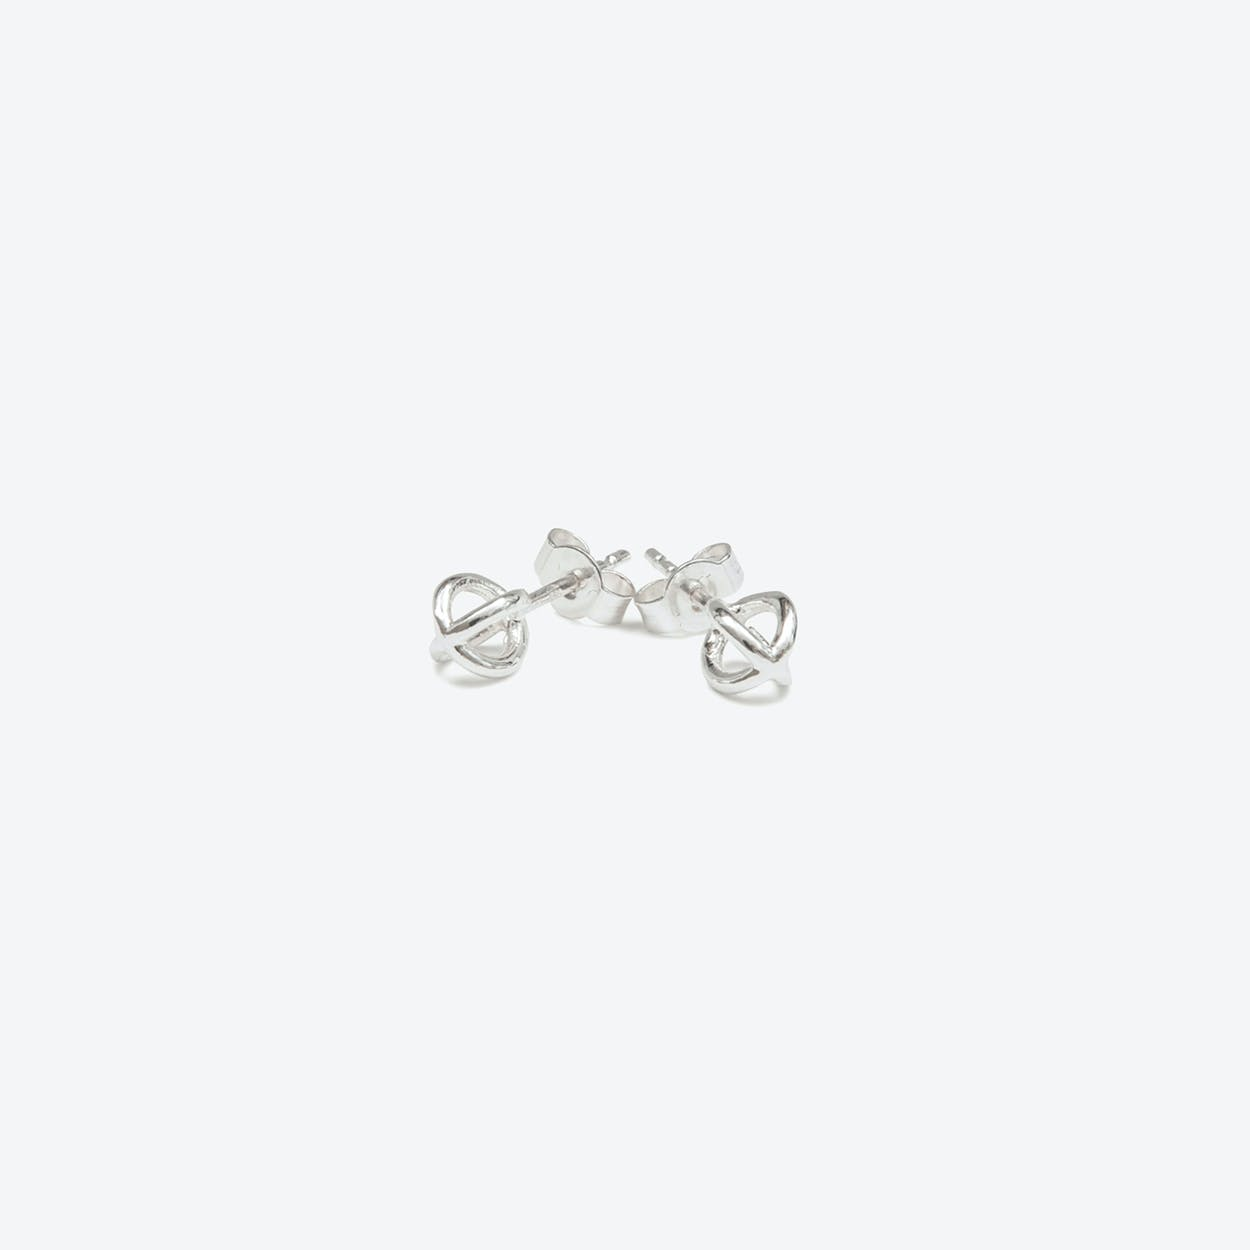 Ear studs KISSKISS in Silver 925